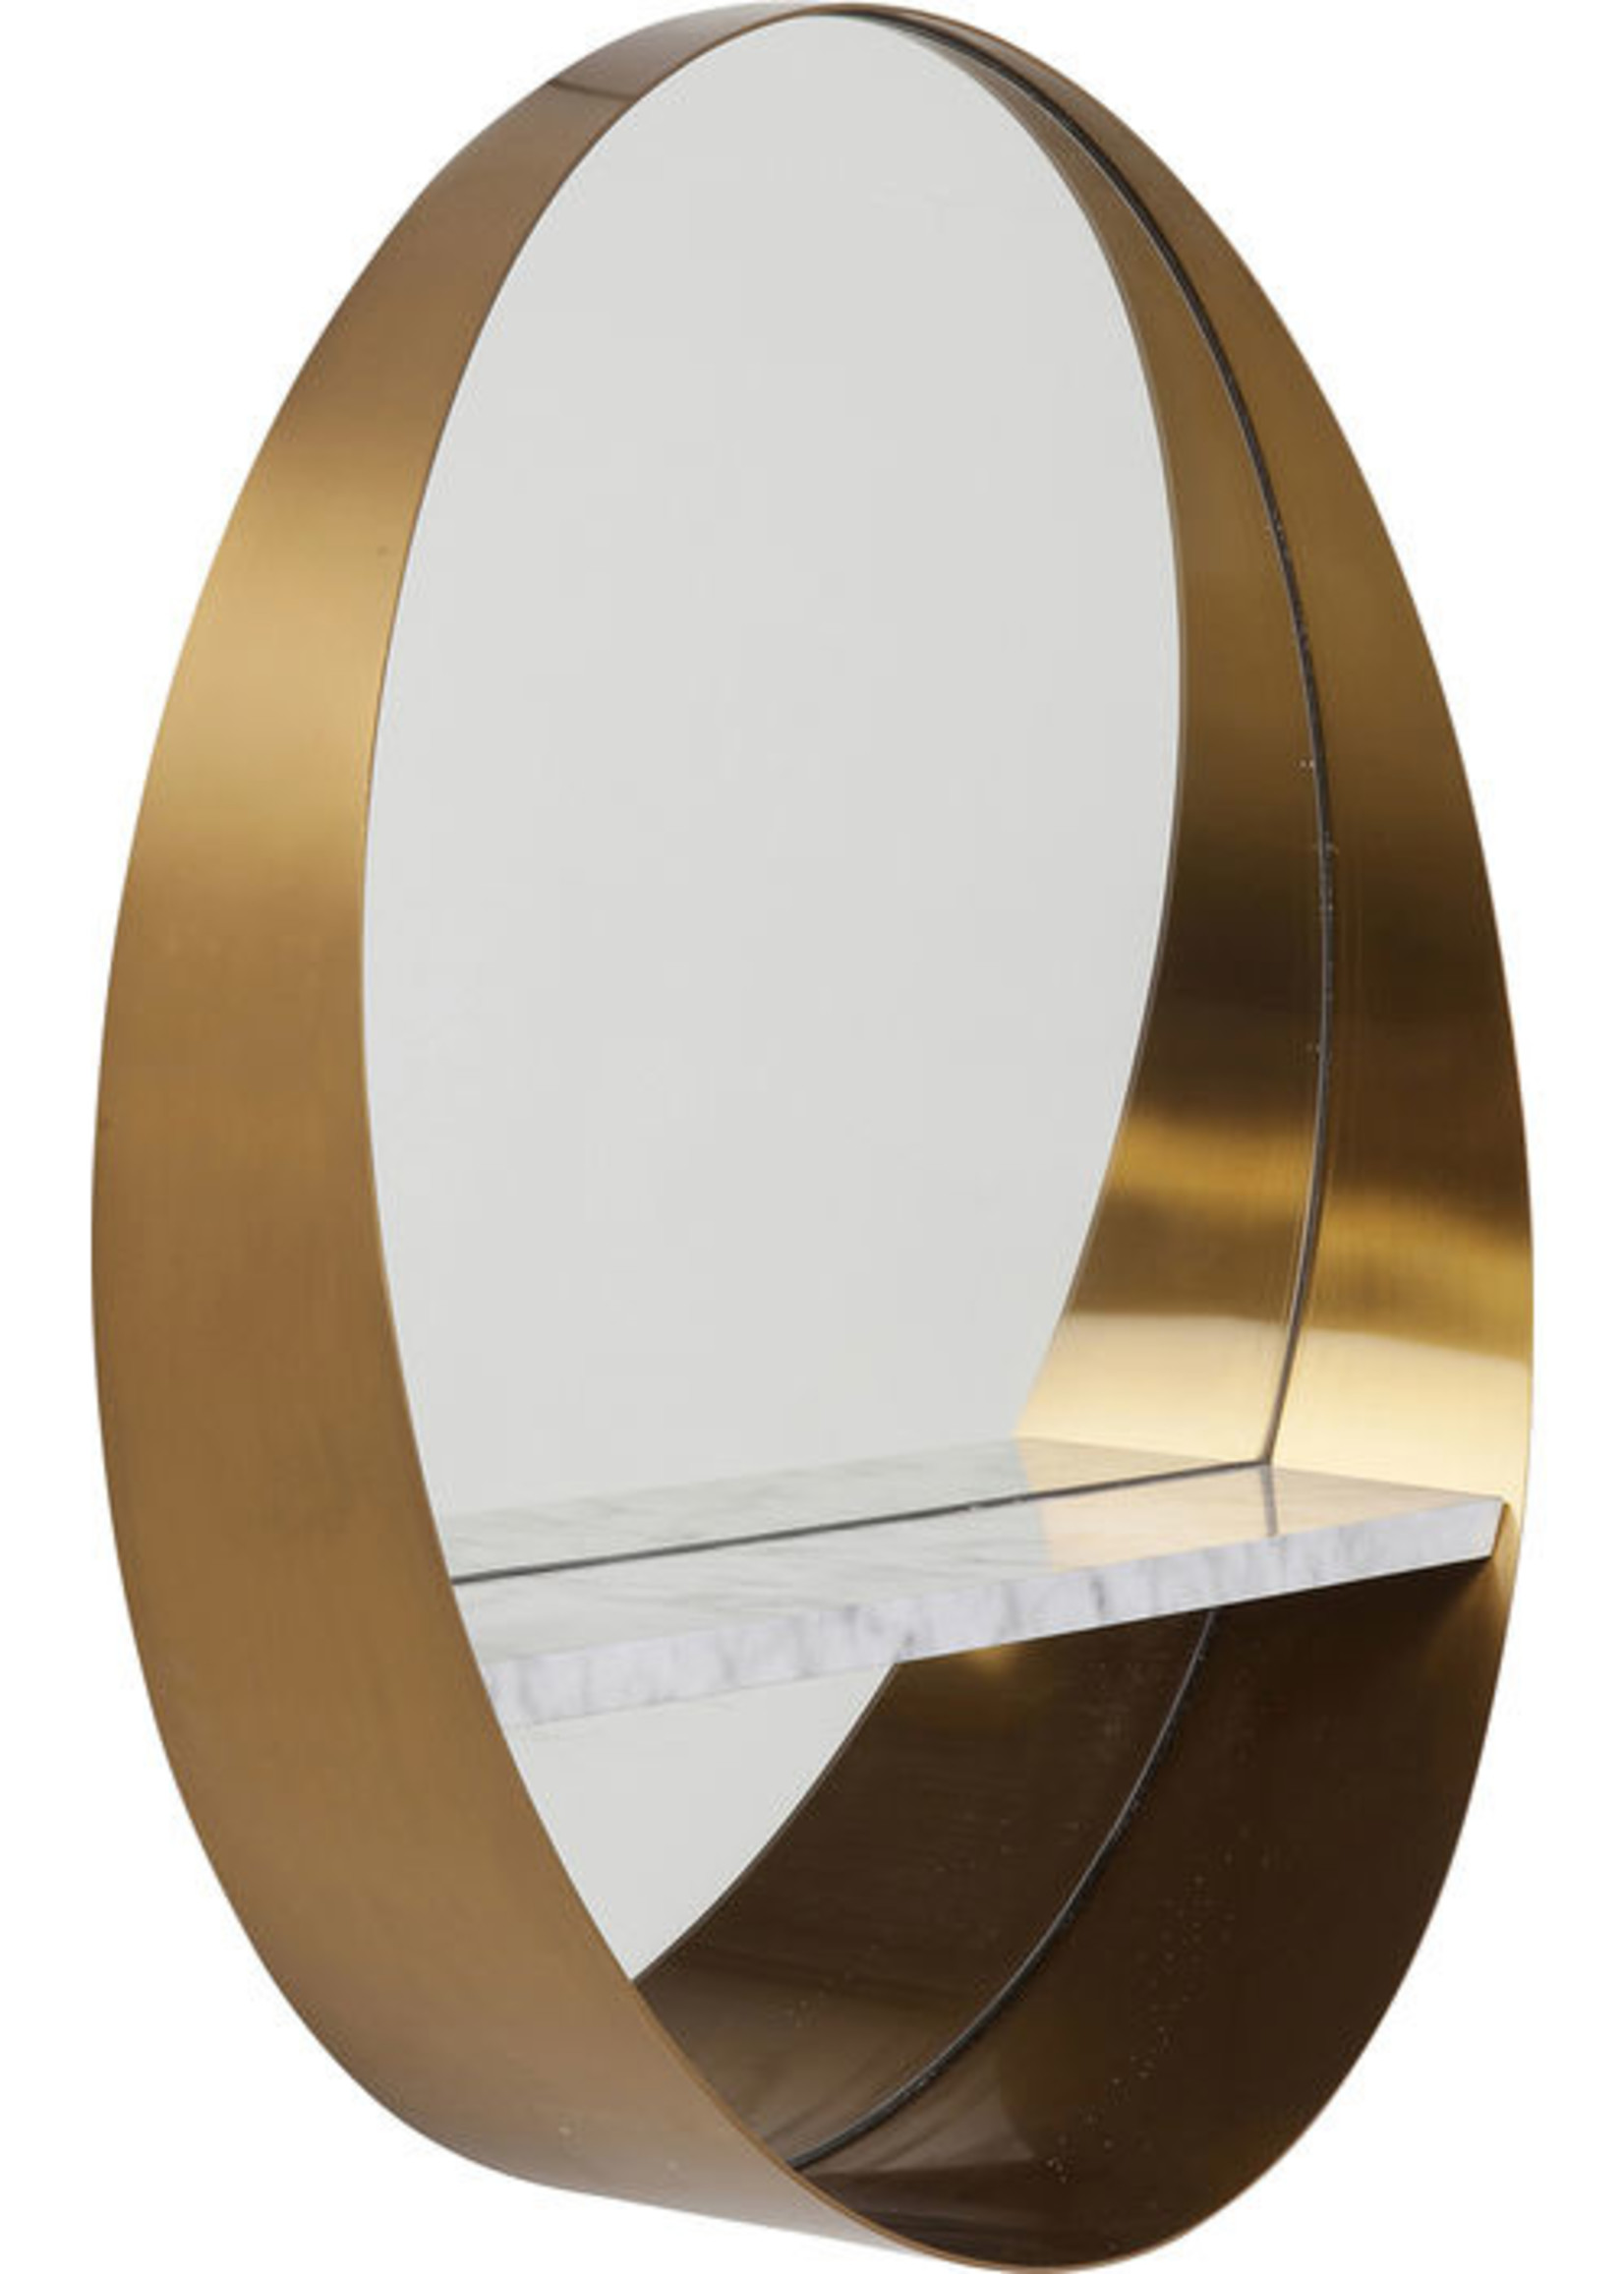 KARE DESIGN Mirror Hipster Shelf Ø65cm